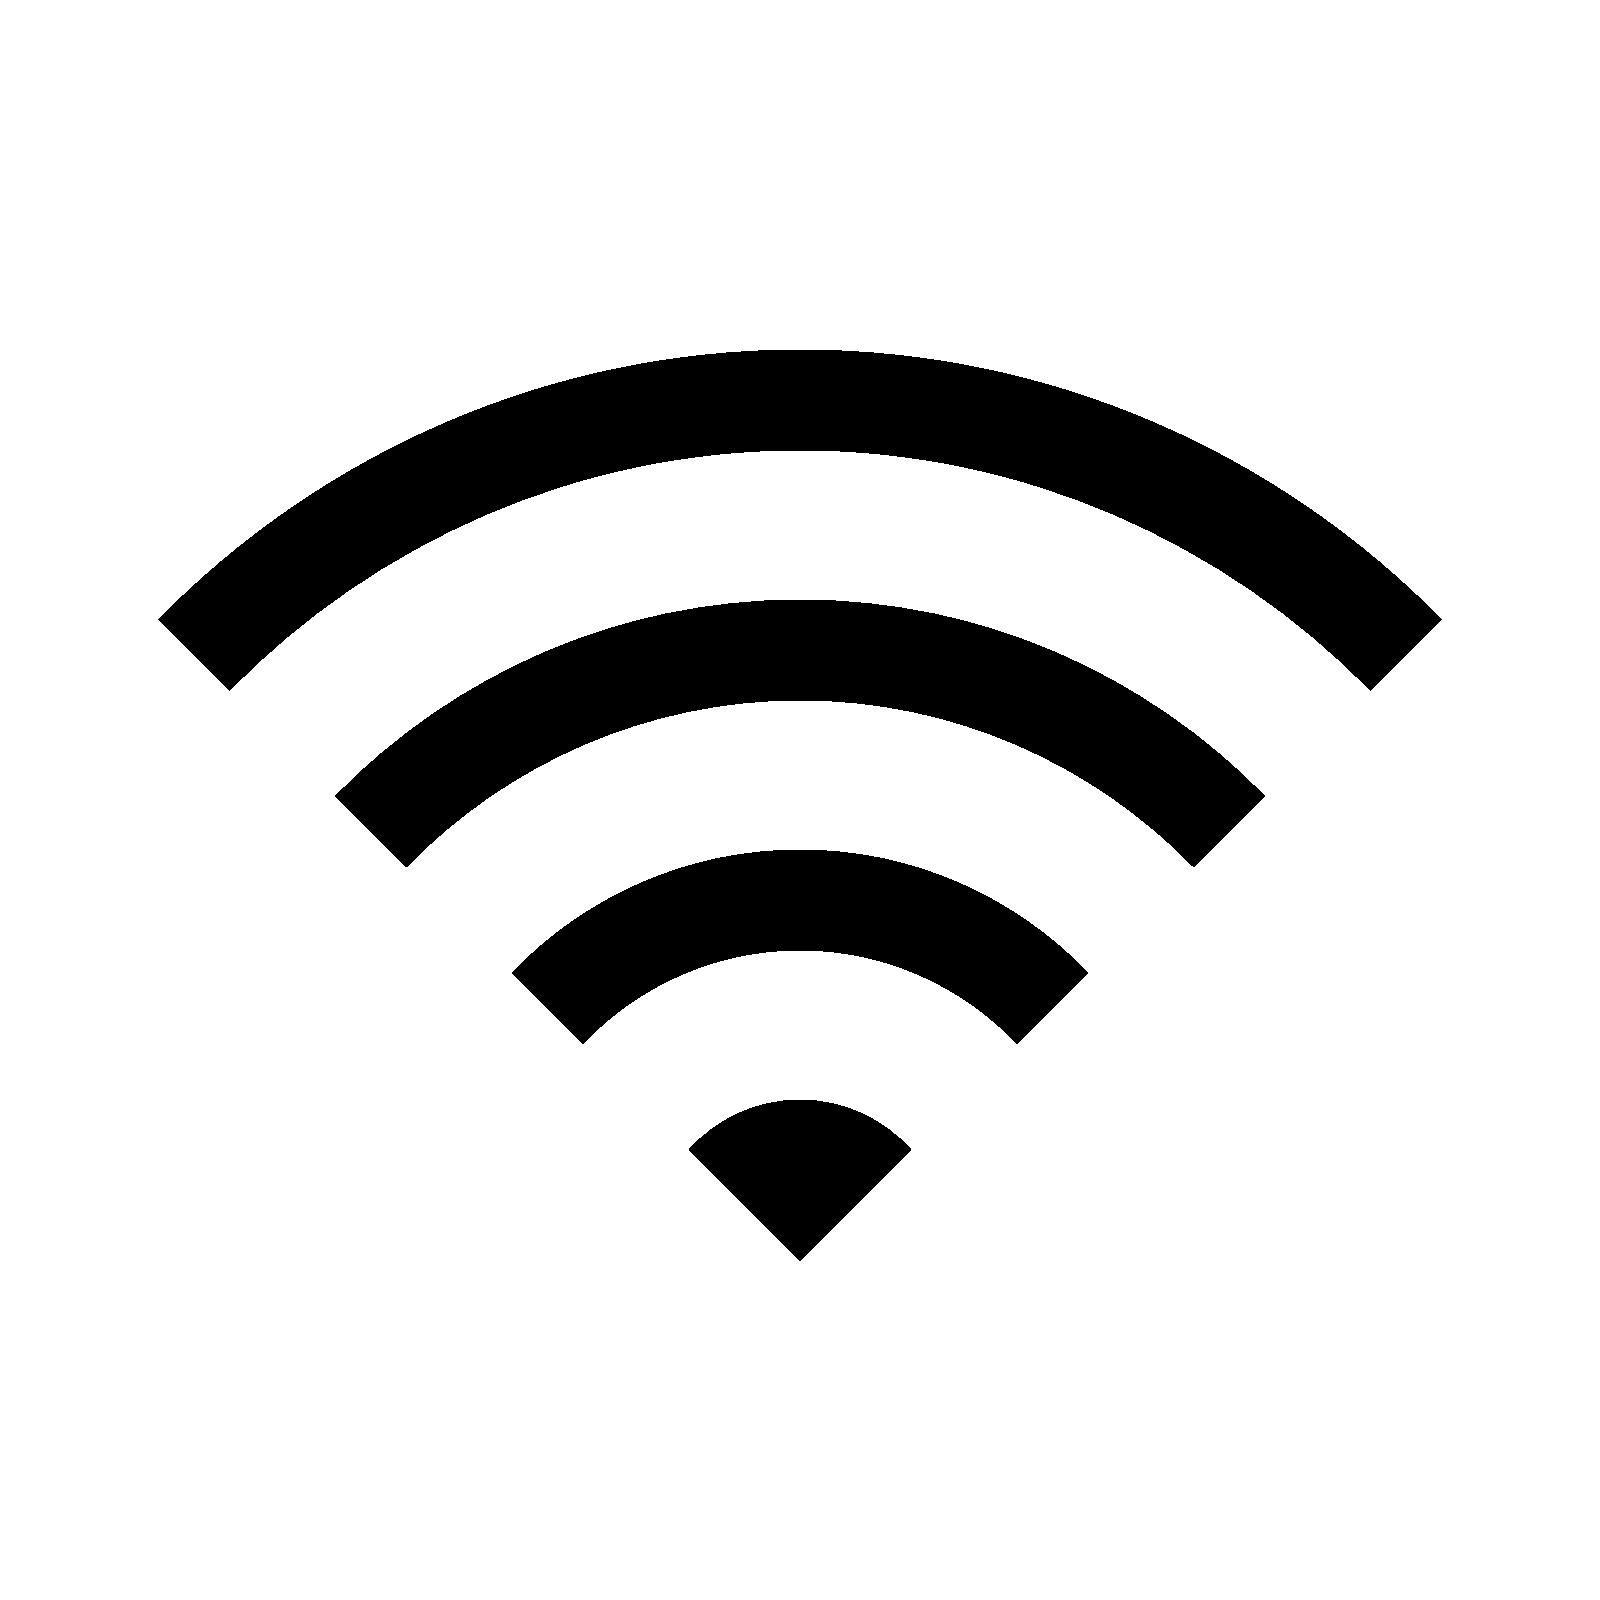 Can I Download Wifi On Nokia asha 305